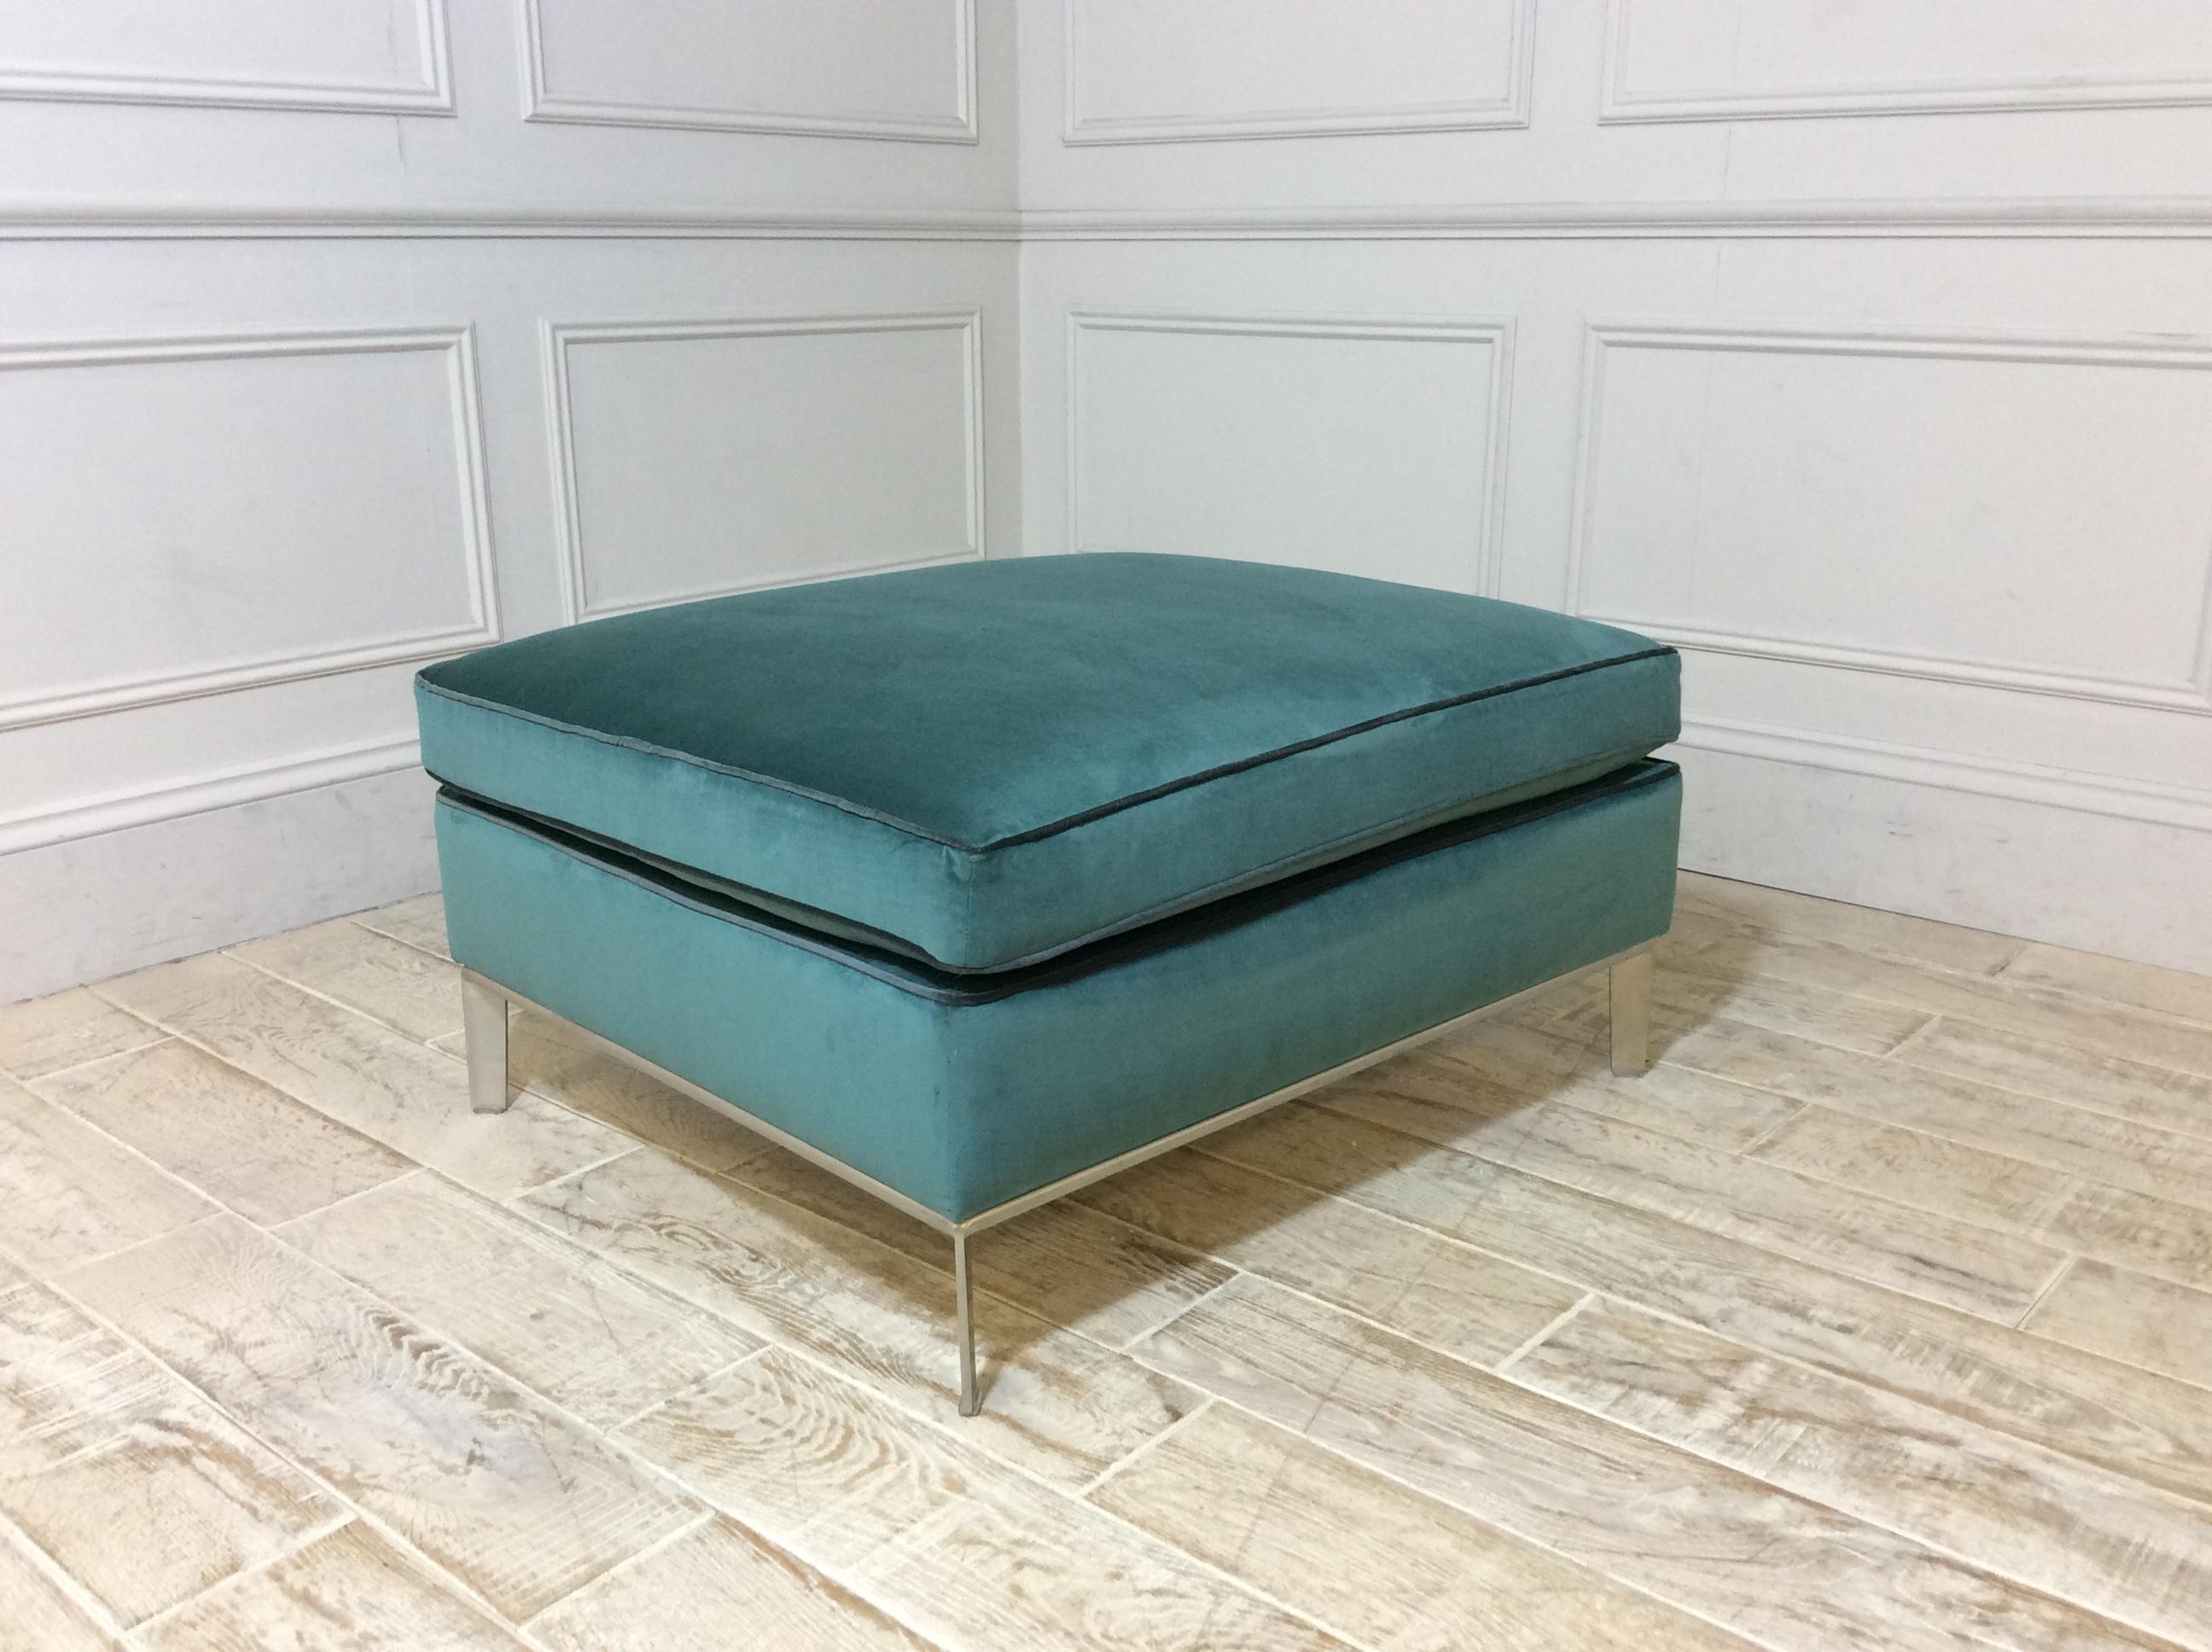 Duresta Domus Brooklyn Footstool in Duresta Fabric Viridian D5